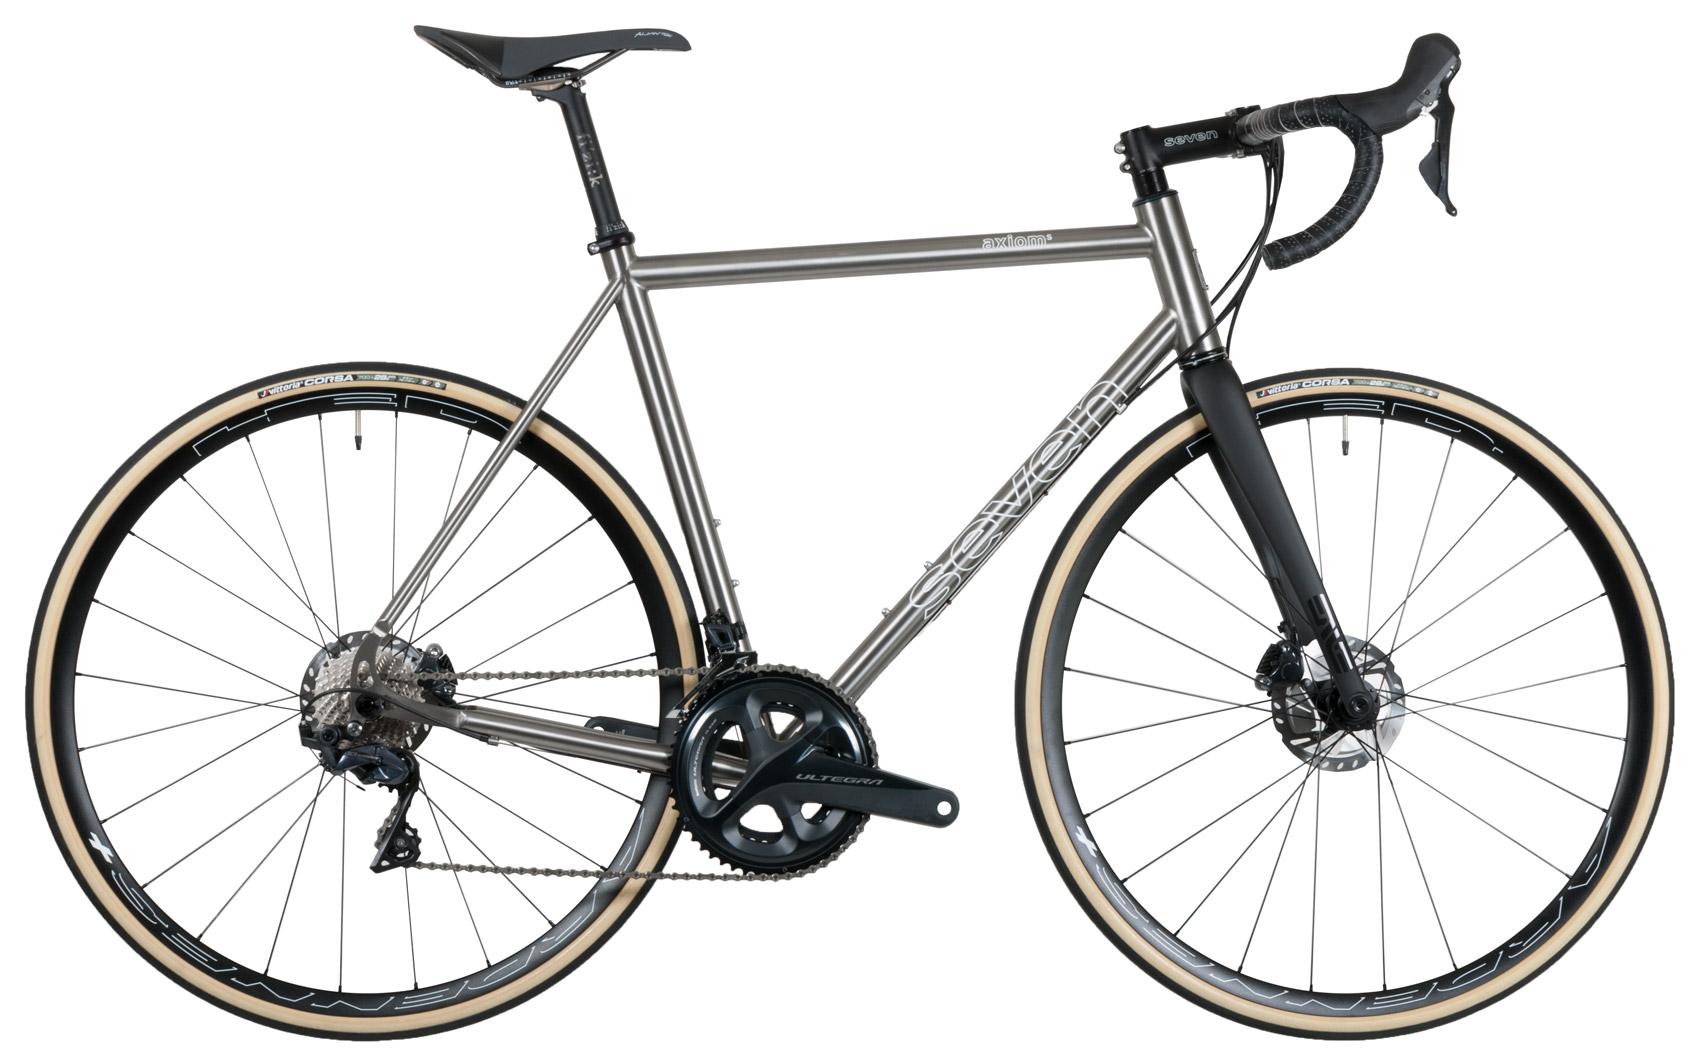 seven cycles discipline muting and urban Custom Honda Street Bikes axiom s